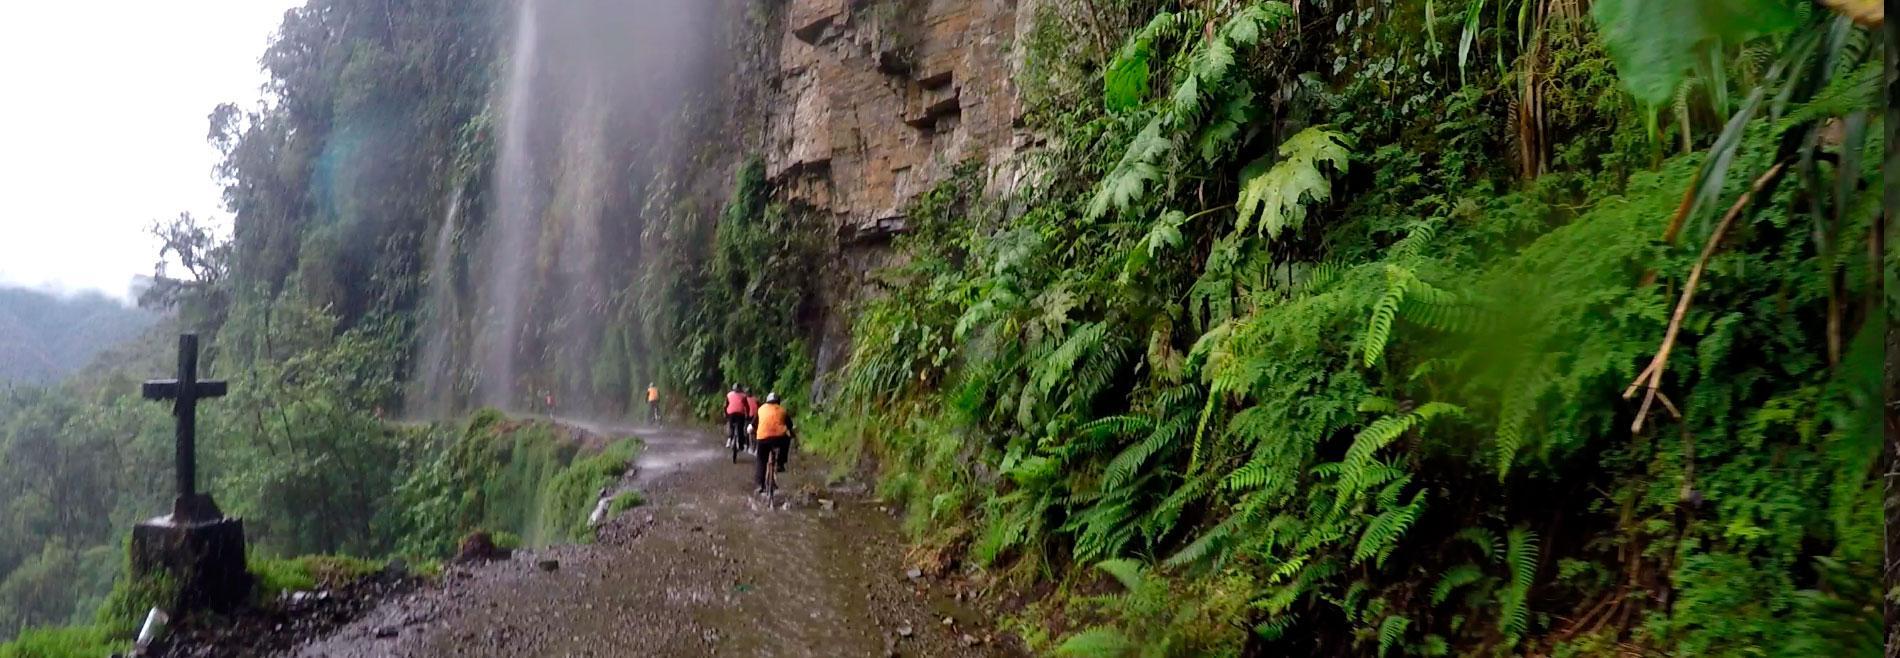 Camino de la Muerte: De La Paz a Coroico en bicicleta ...